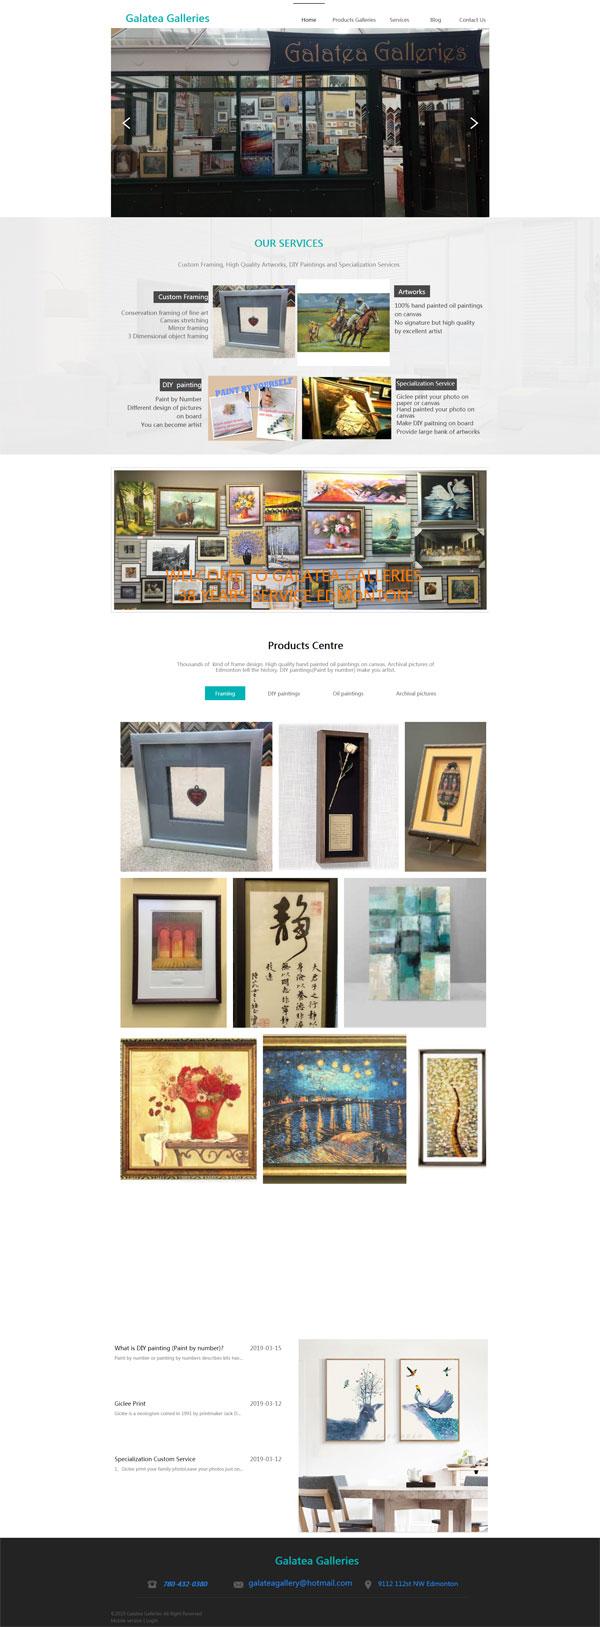 网站案例:Galatea Galleries